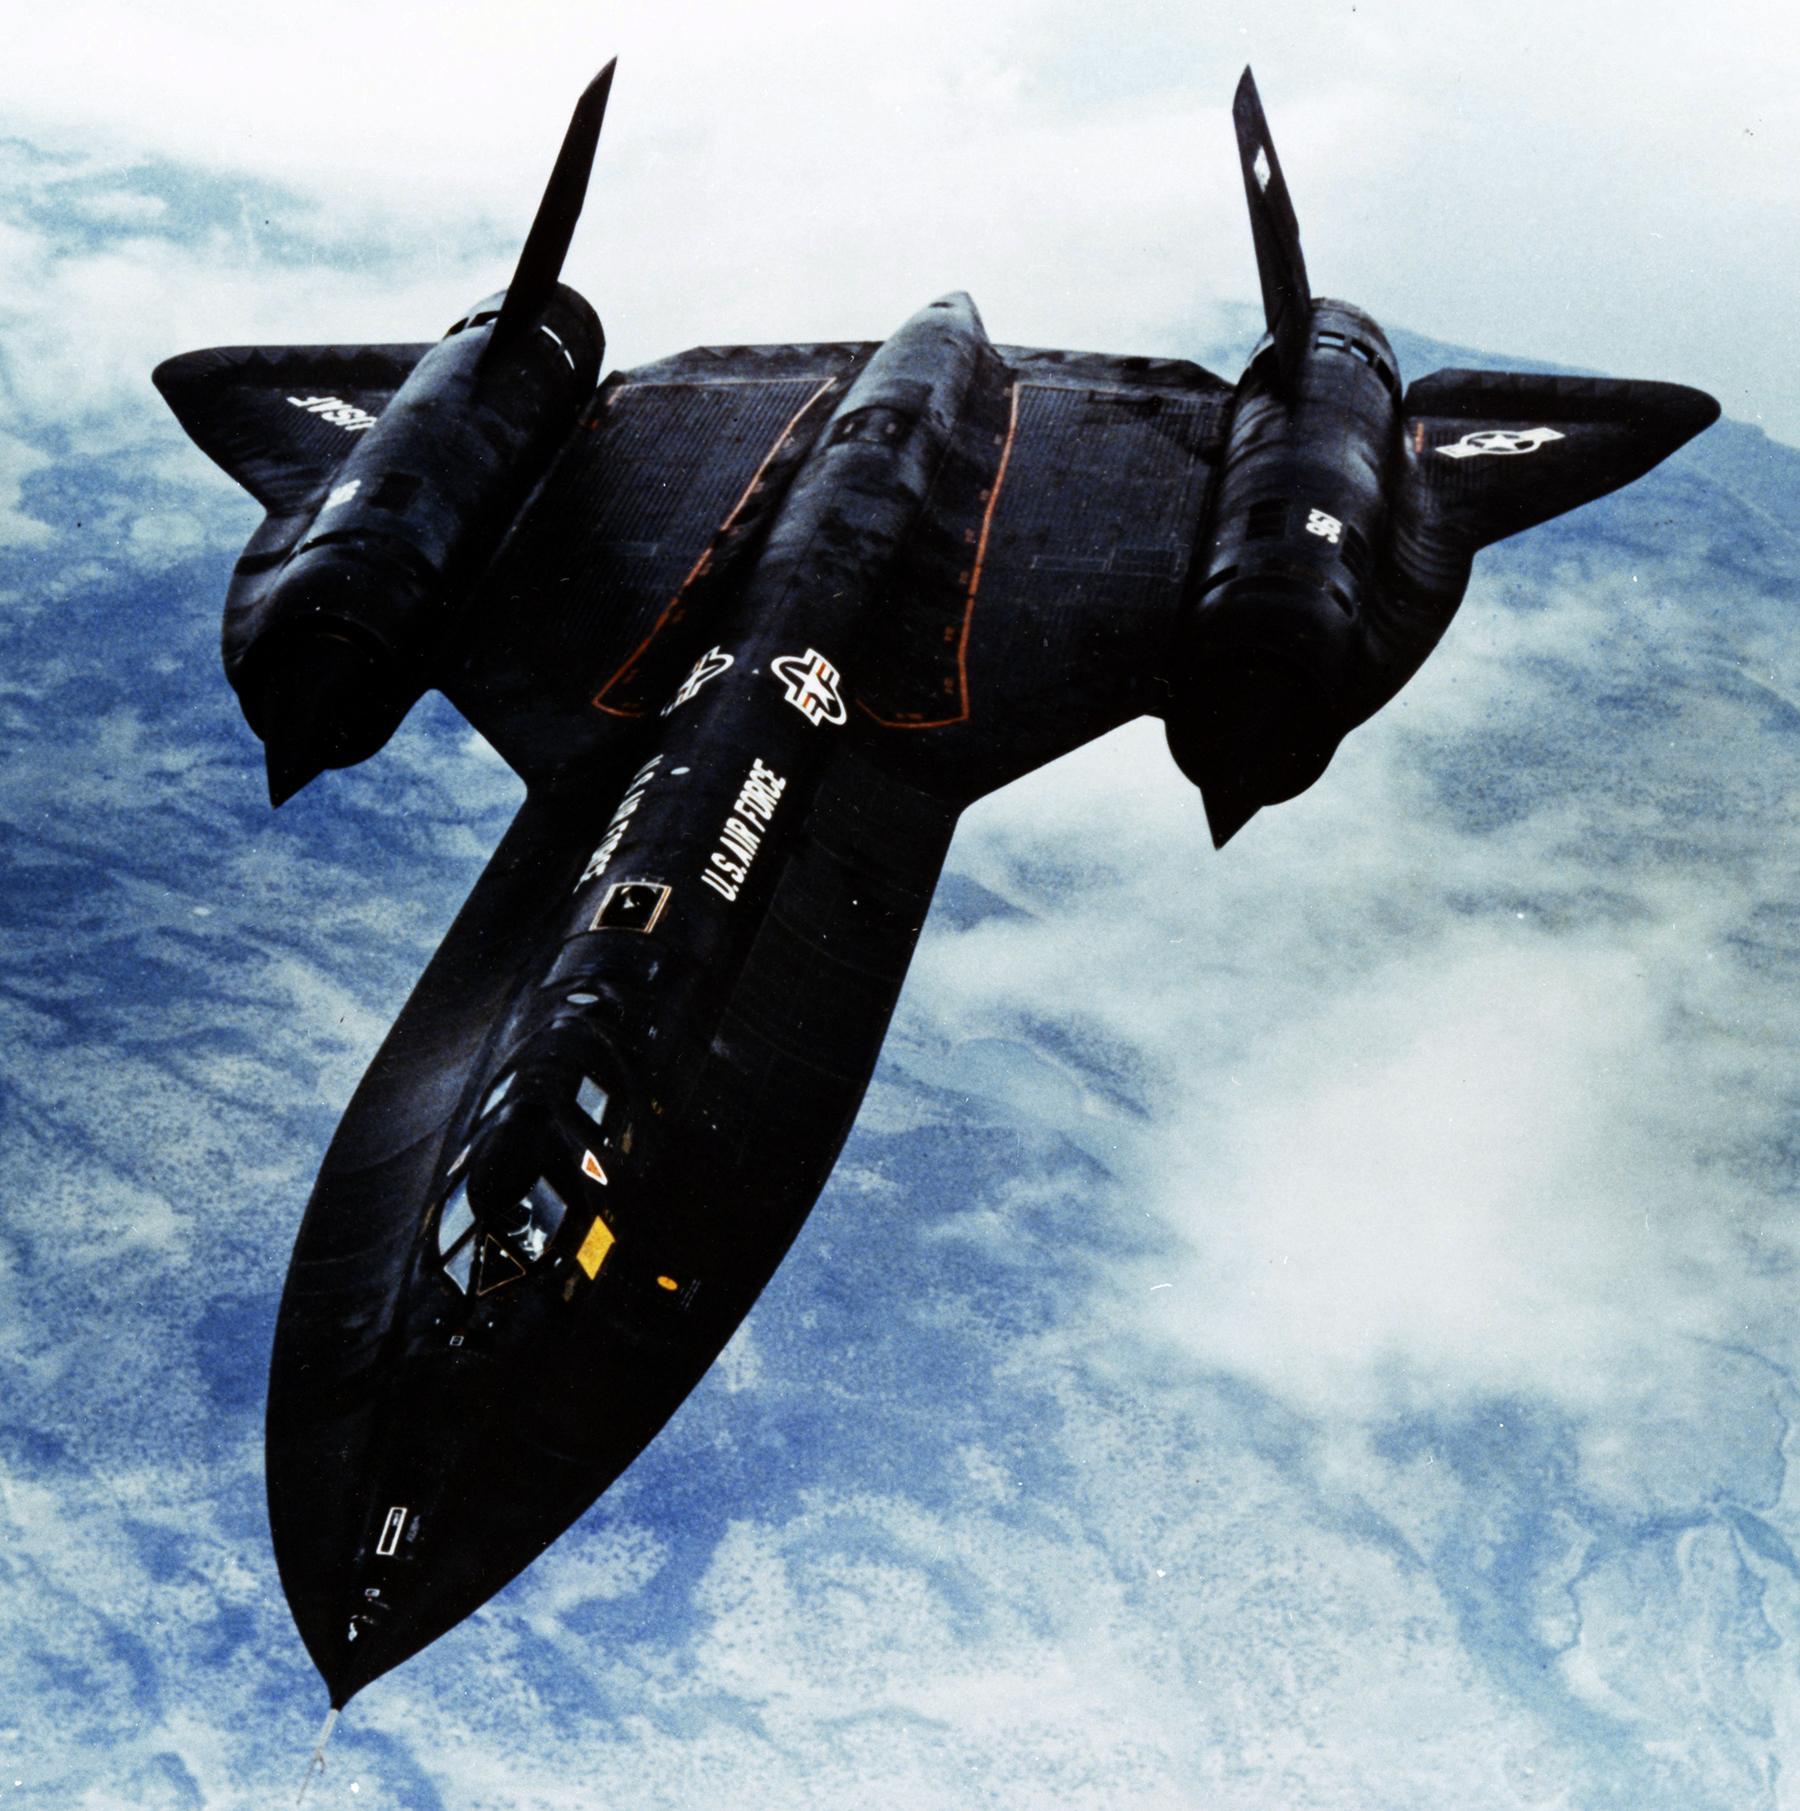 Airframe-SR-71-Blackbird-017.jpg